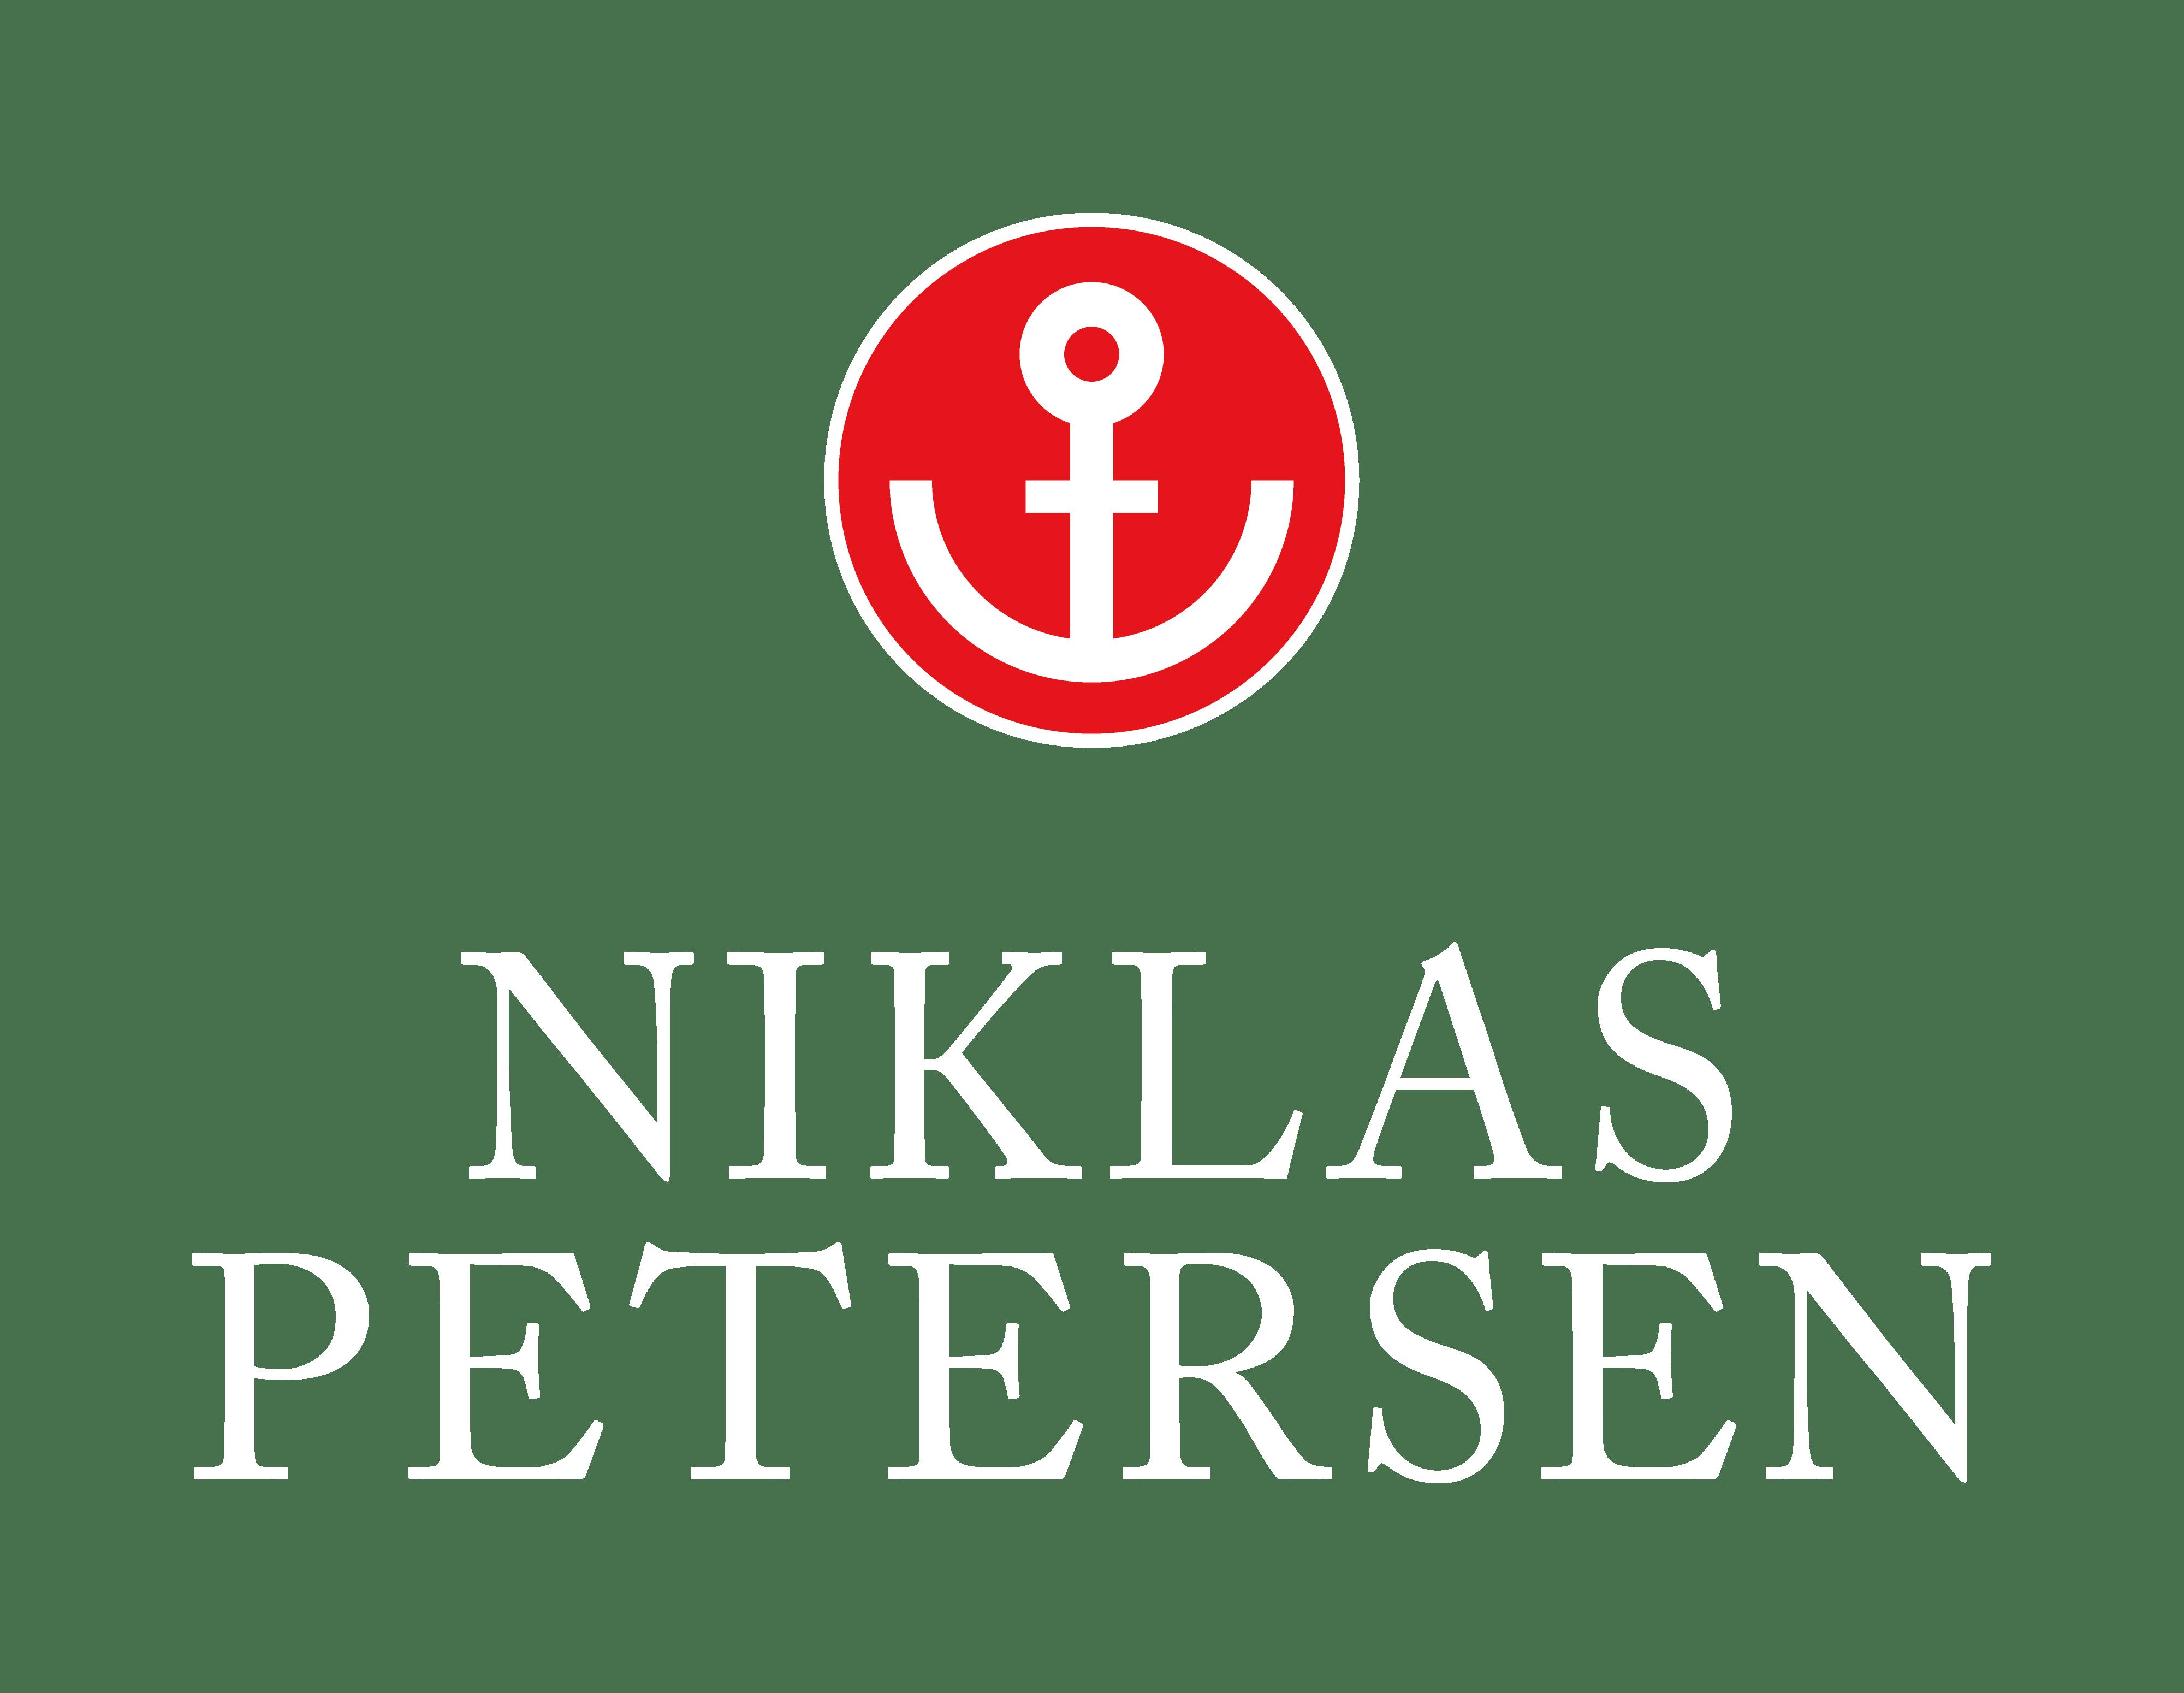 Niklas Petersen Consulting